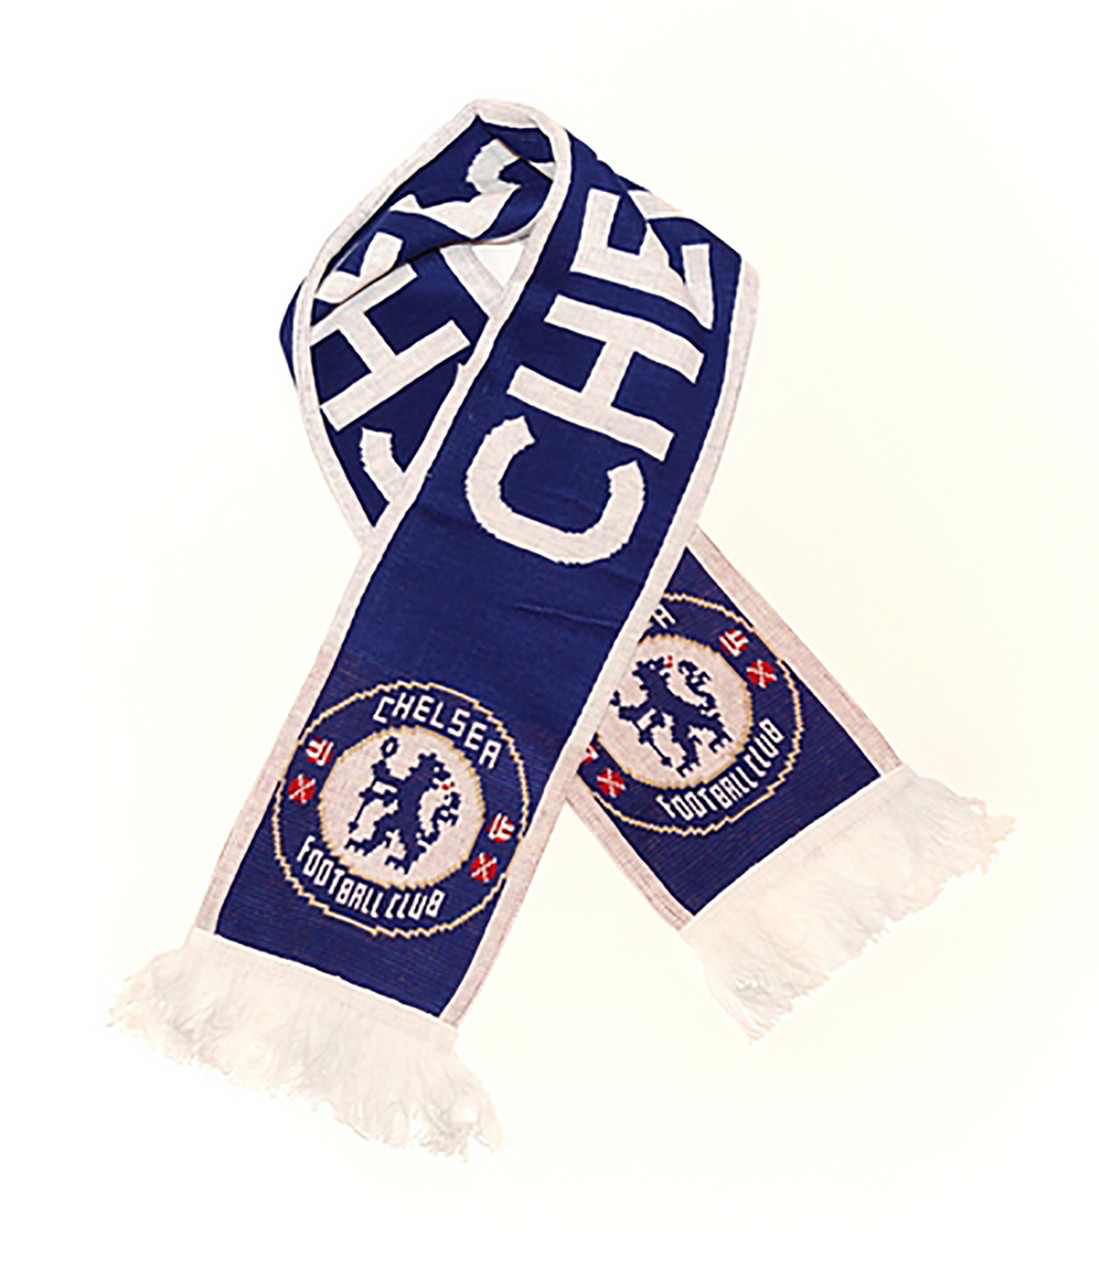 Chelsea Fc Licensed Logo Scarf